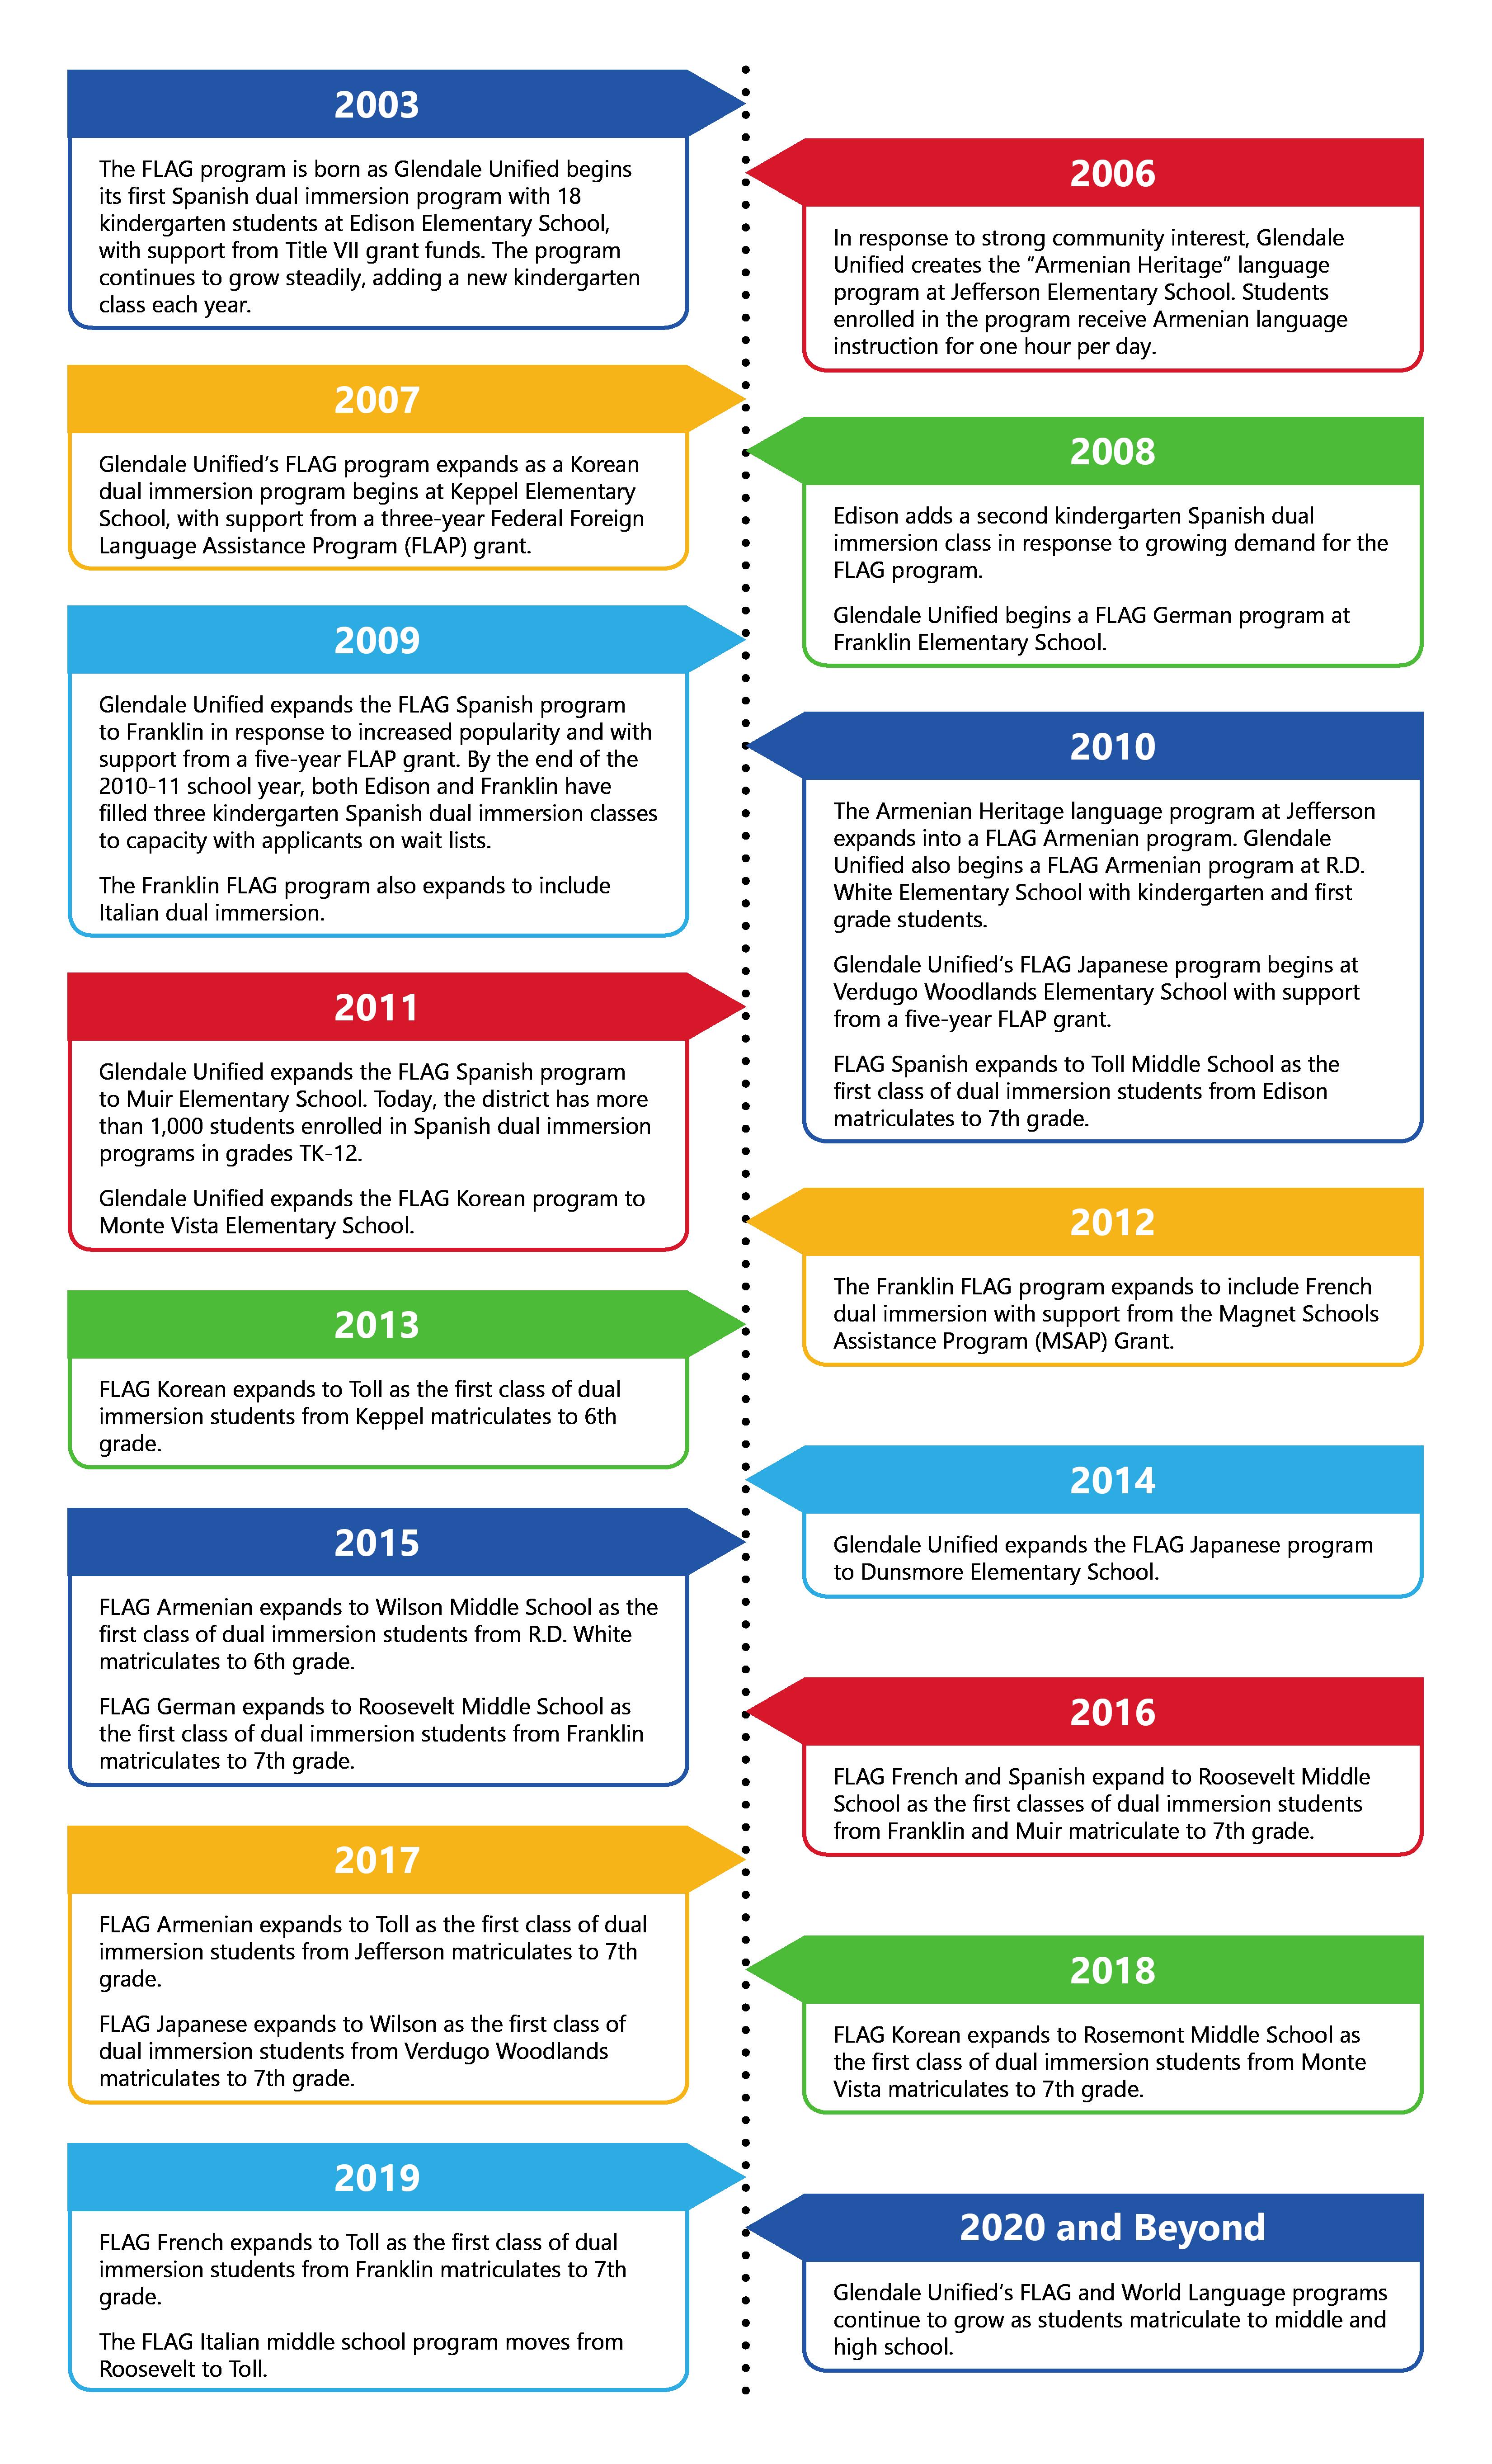 FLAG Timeline Infographic